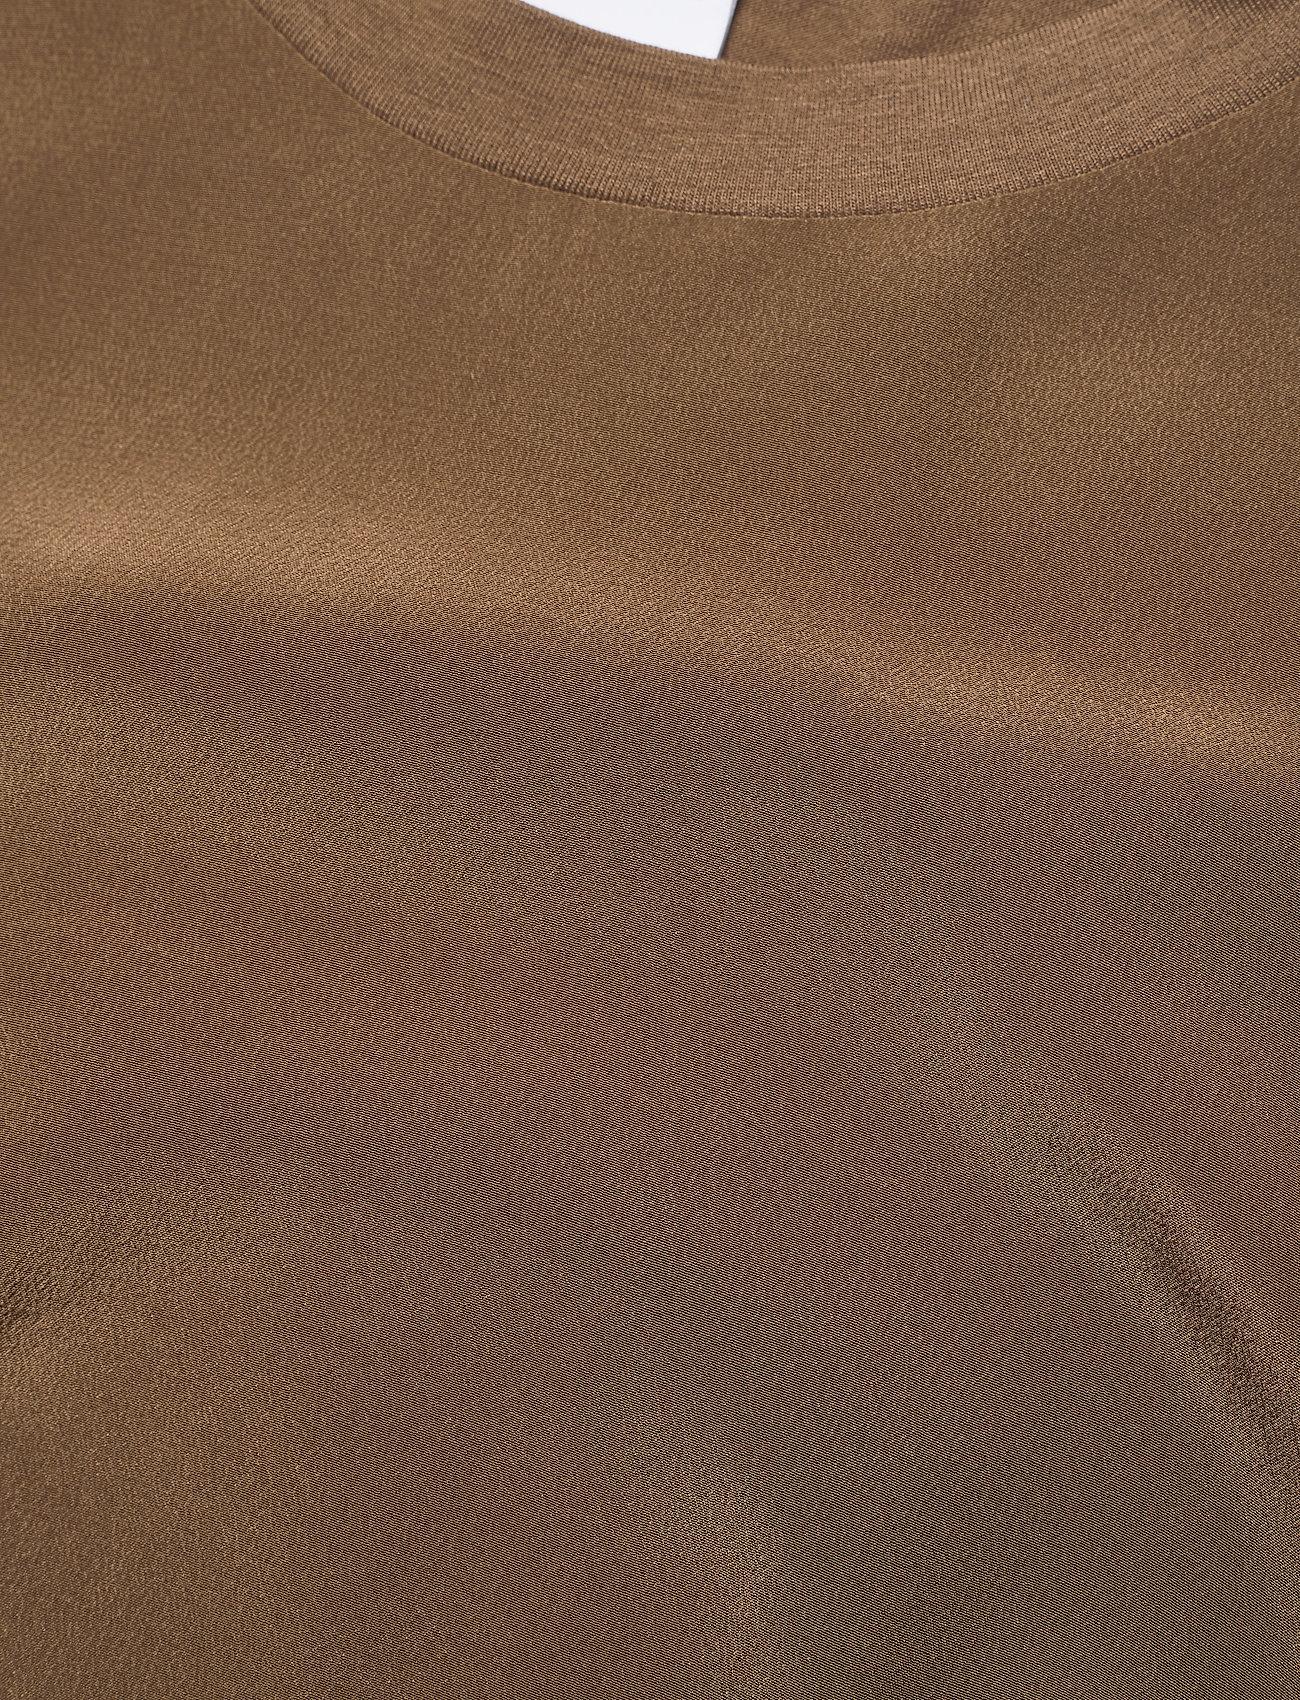 Max Mara Leisure - POSATO - t-shirts - golden green brown - 2